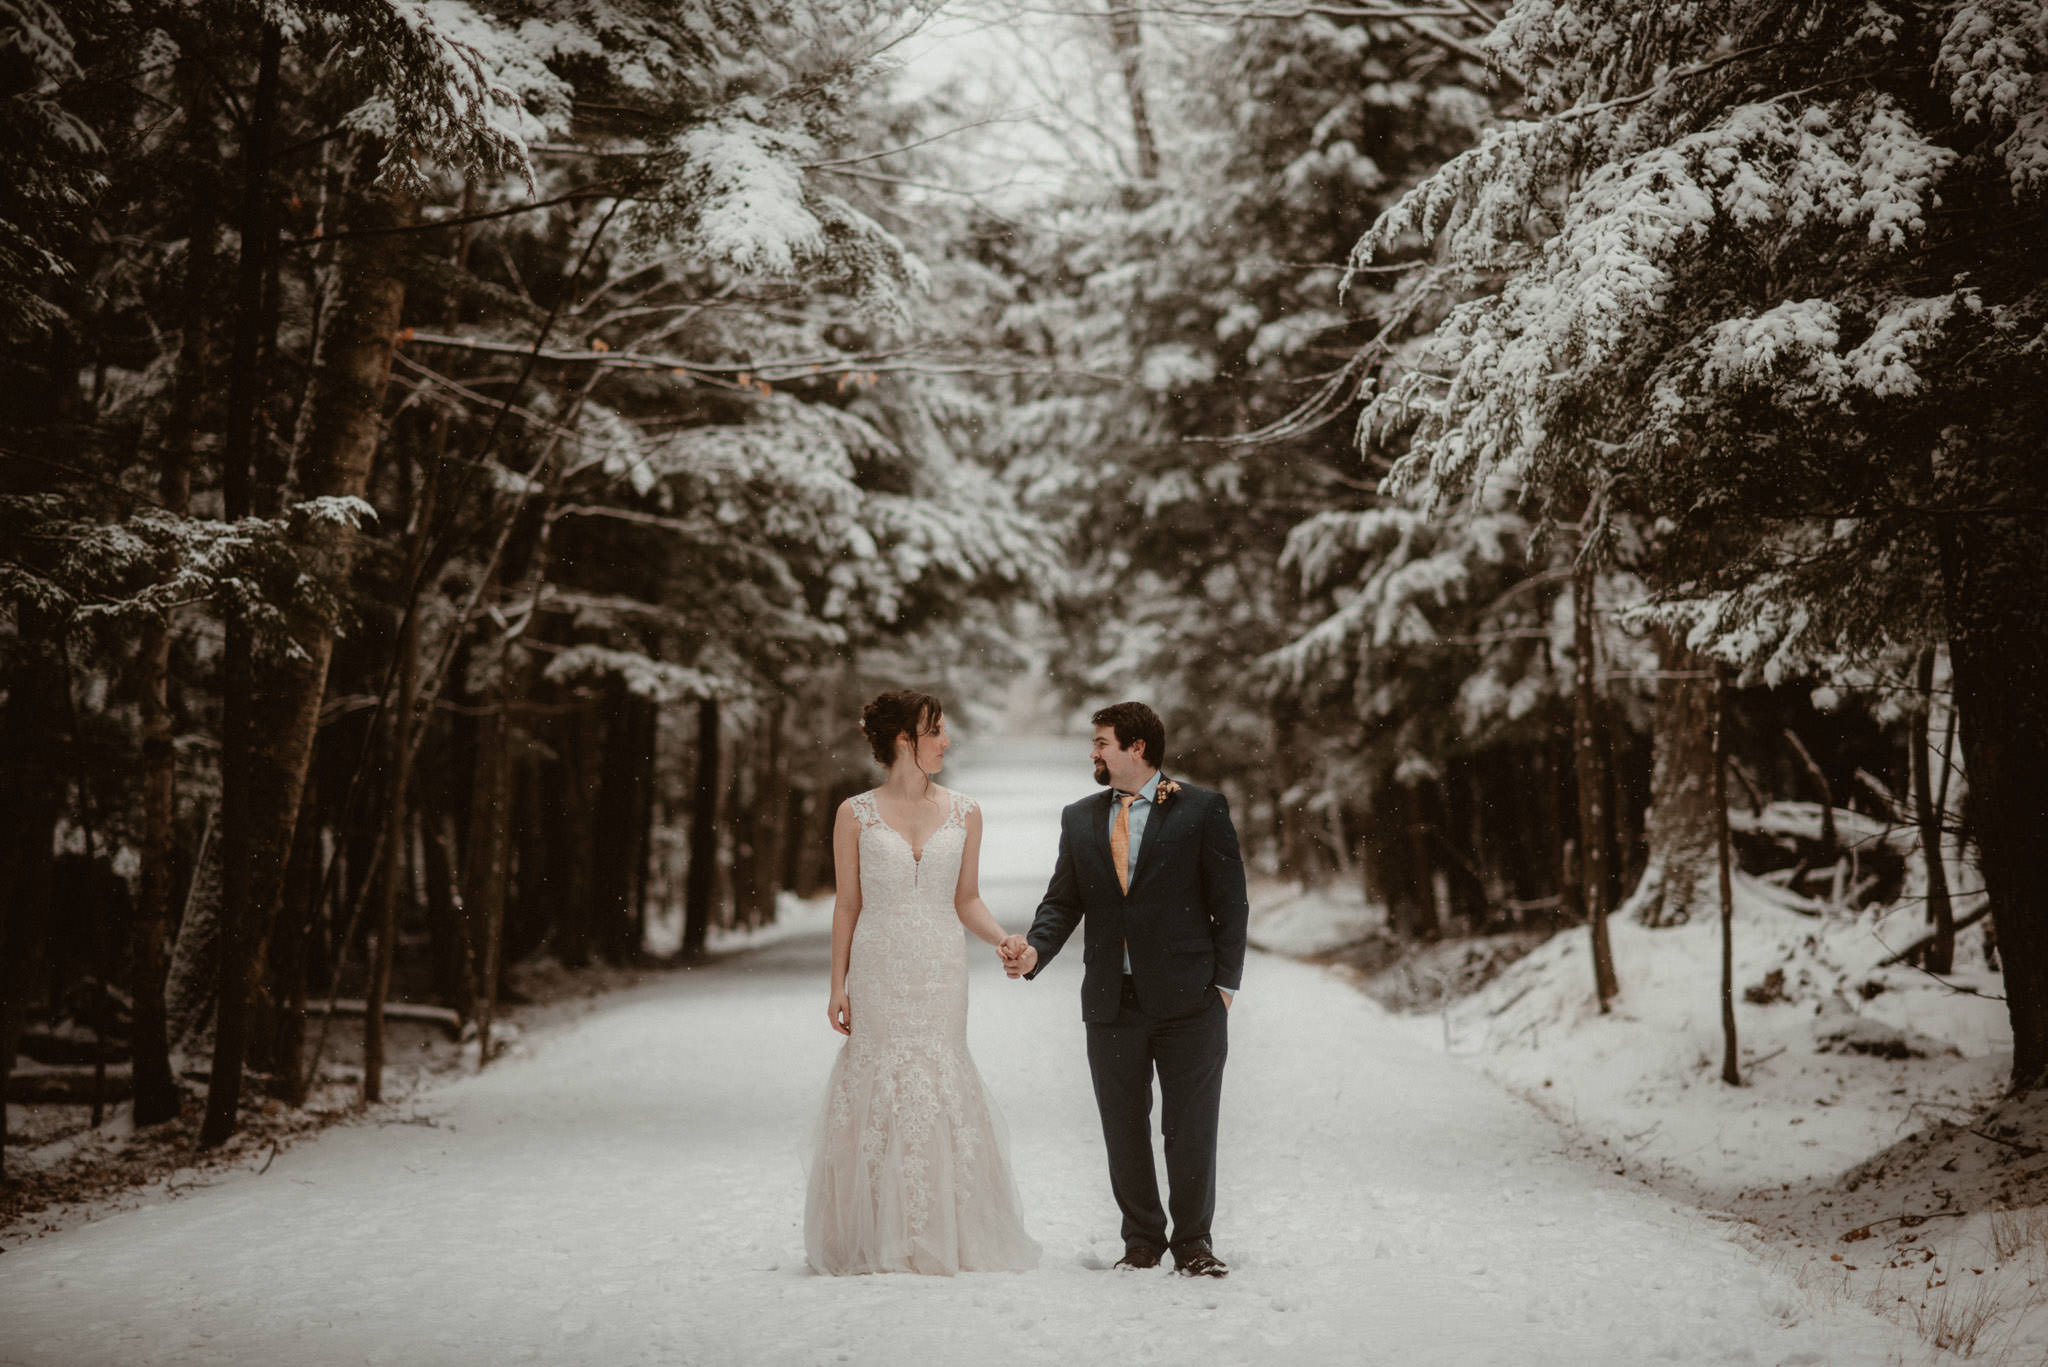 Beautiful snowy elopement in Michigan's Upper Peninsula